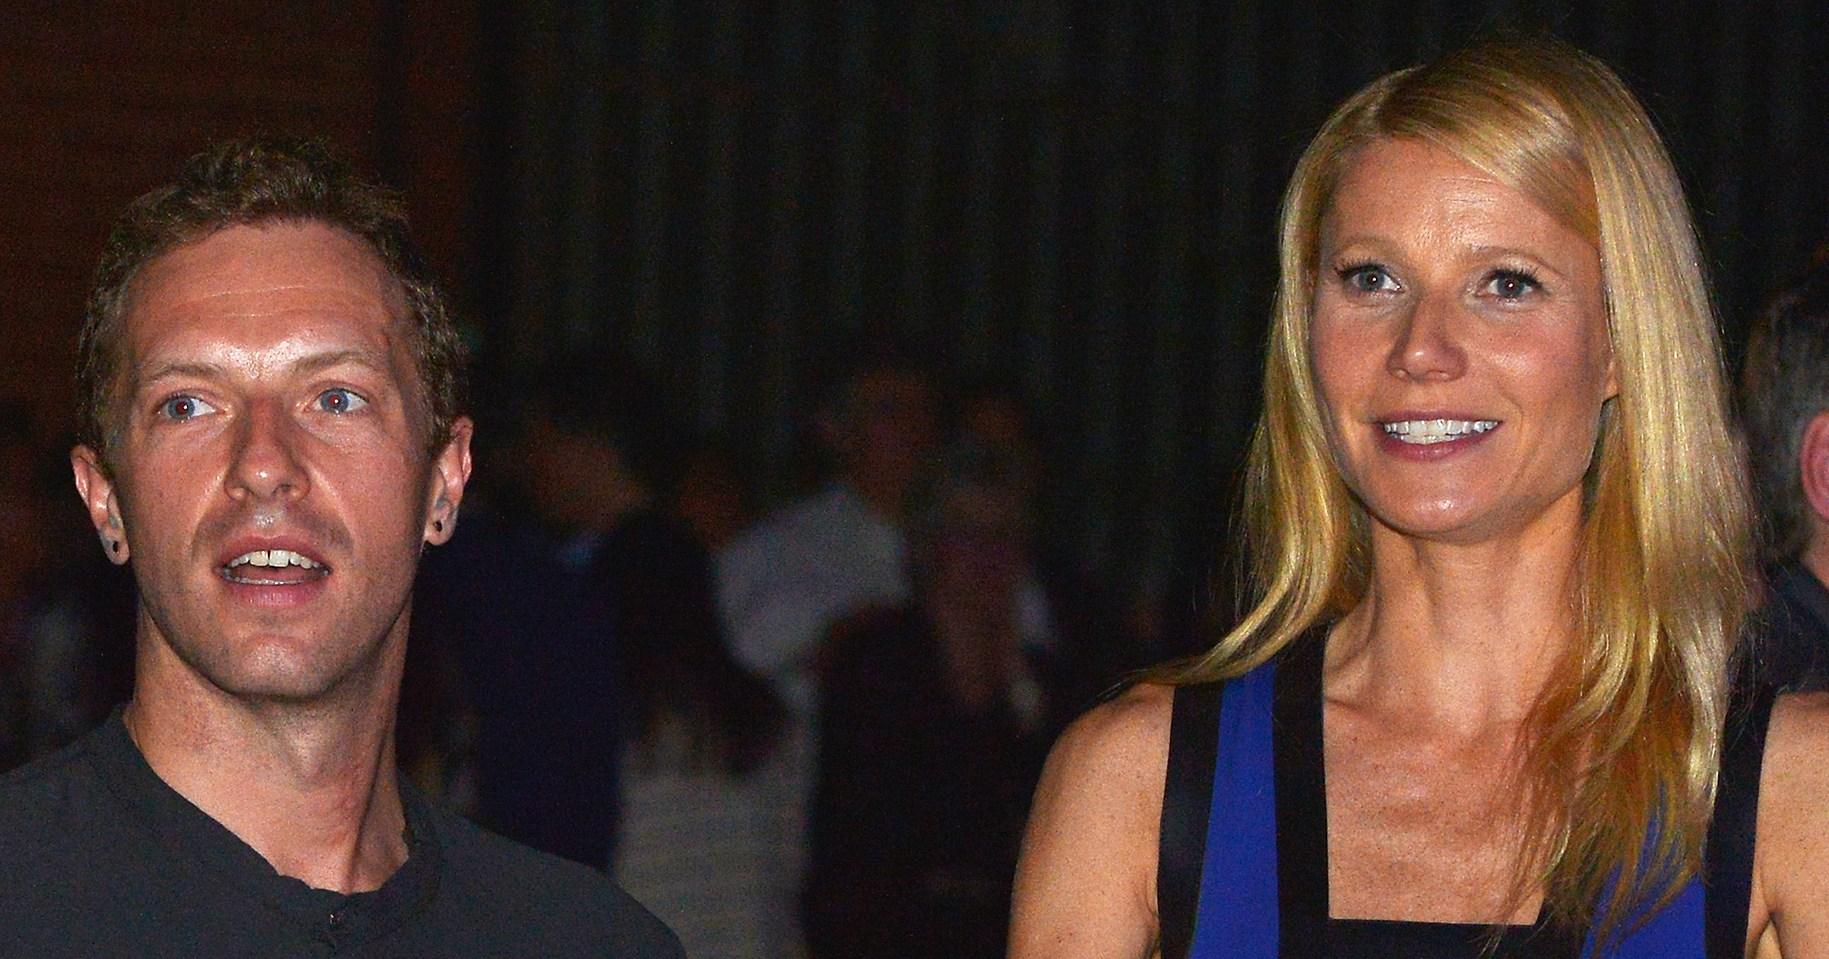 Gwyneth Paltrow Honeymoons With Brad Falchuk, Ex Chris Martin